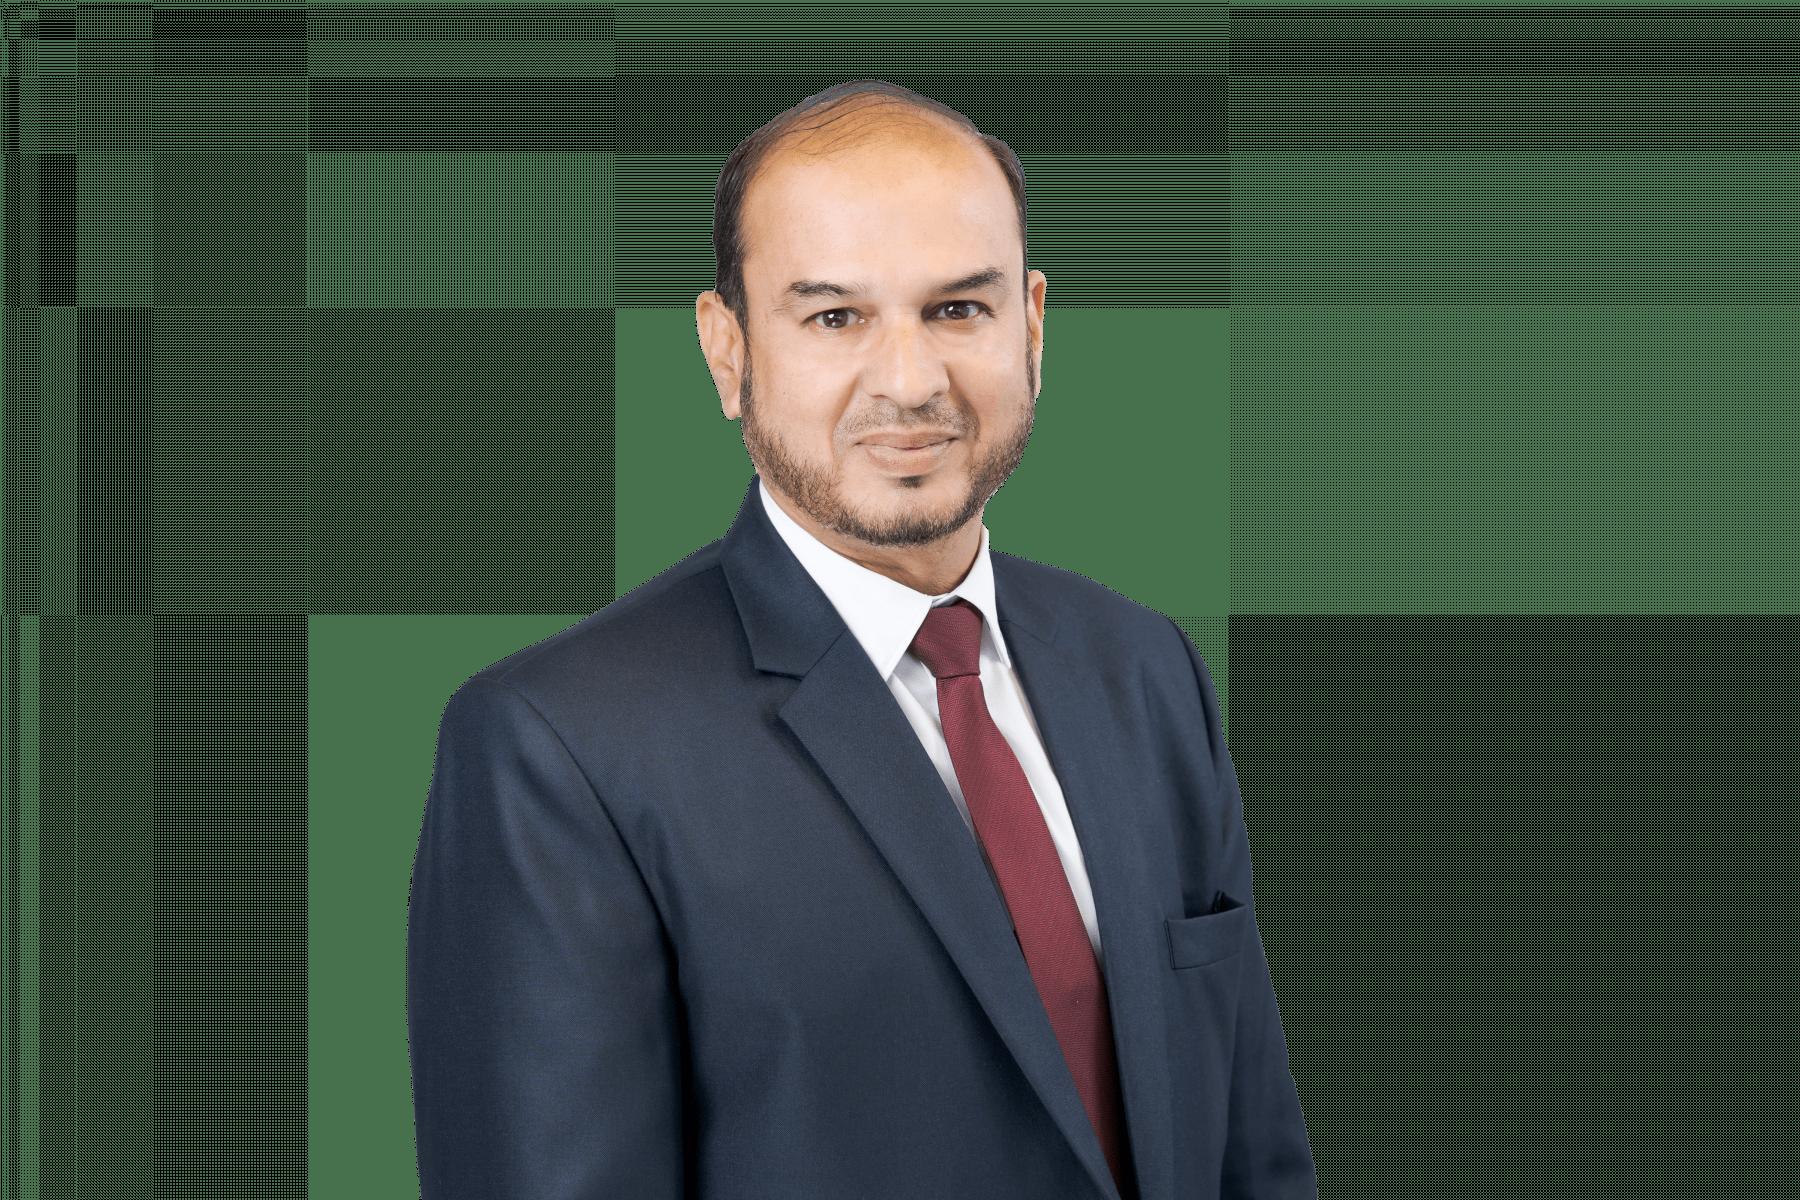 Amin Chishti | Public Relationships Officer | Farani Taylor Solicitors